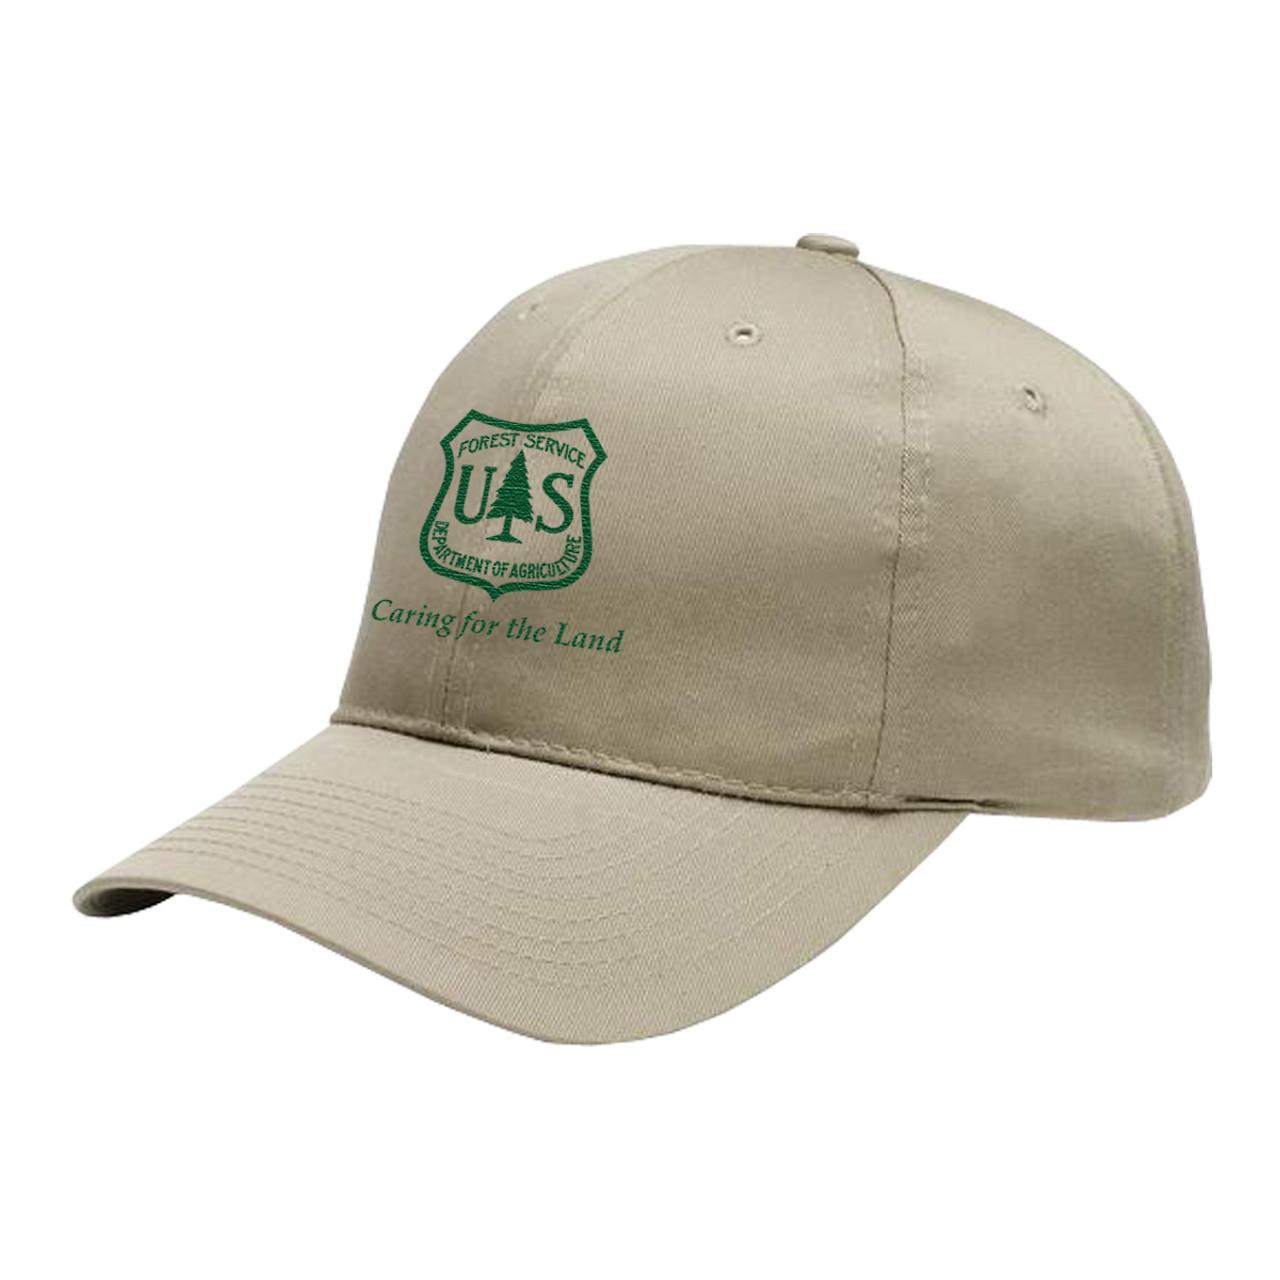 Forest Service Cap - Khaki